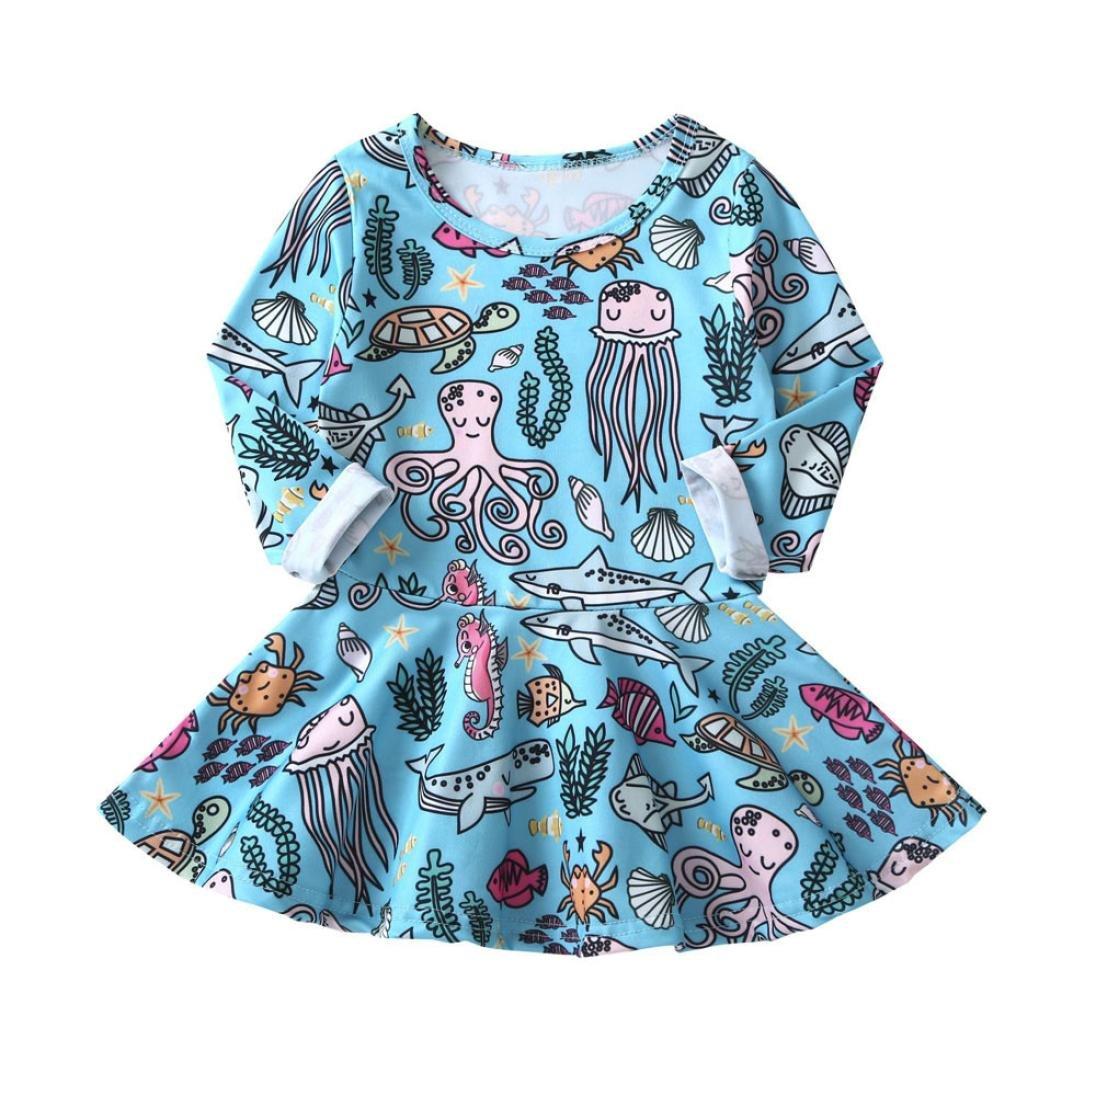 01a9040ffe86 Amazon.com  Toddler Baby Girls Infant Ocean Animal Fish Cartoon Long ...